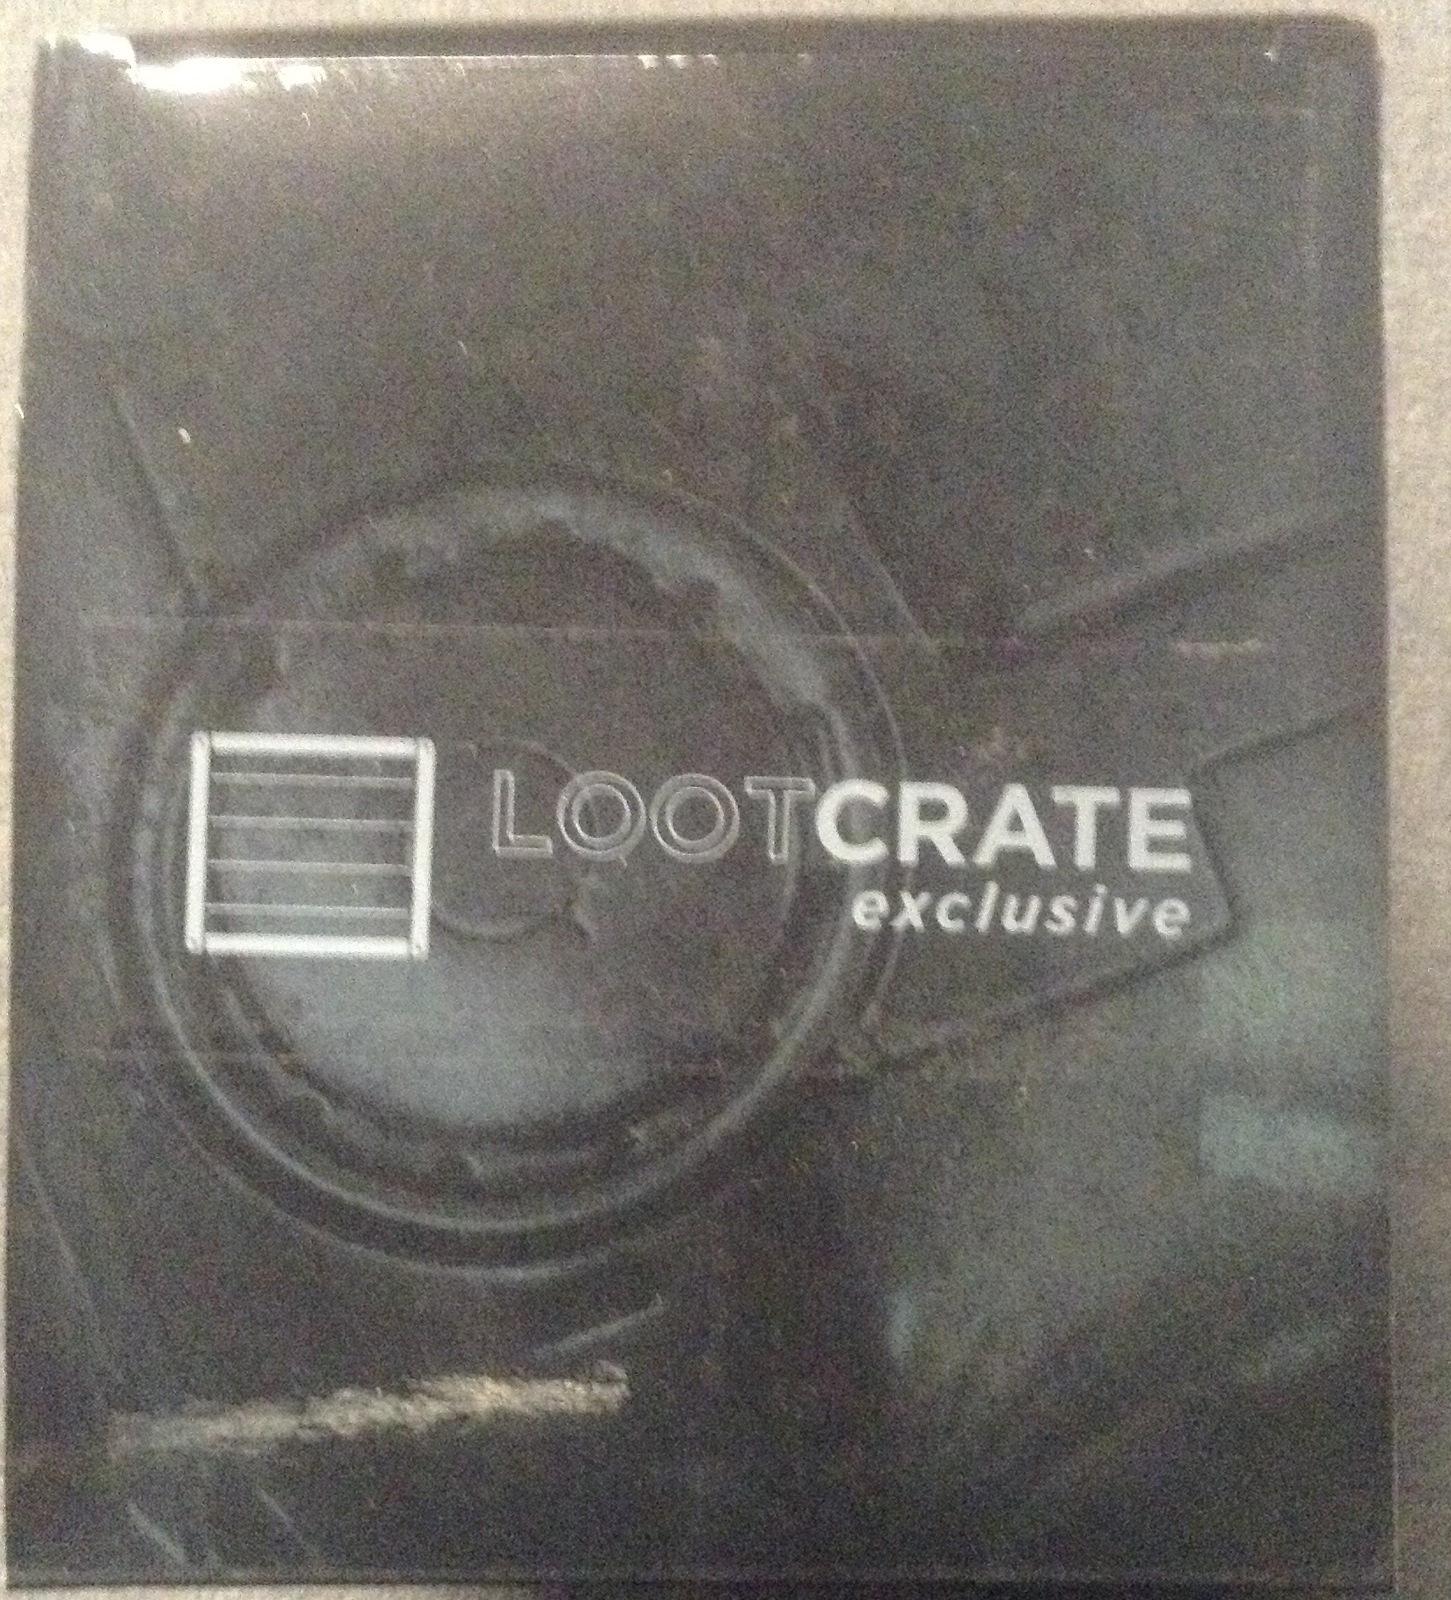 Terminator Genisys Half Scale Endo Skull Replica Movie Loot Crate Exclusive